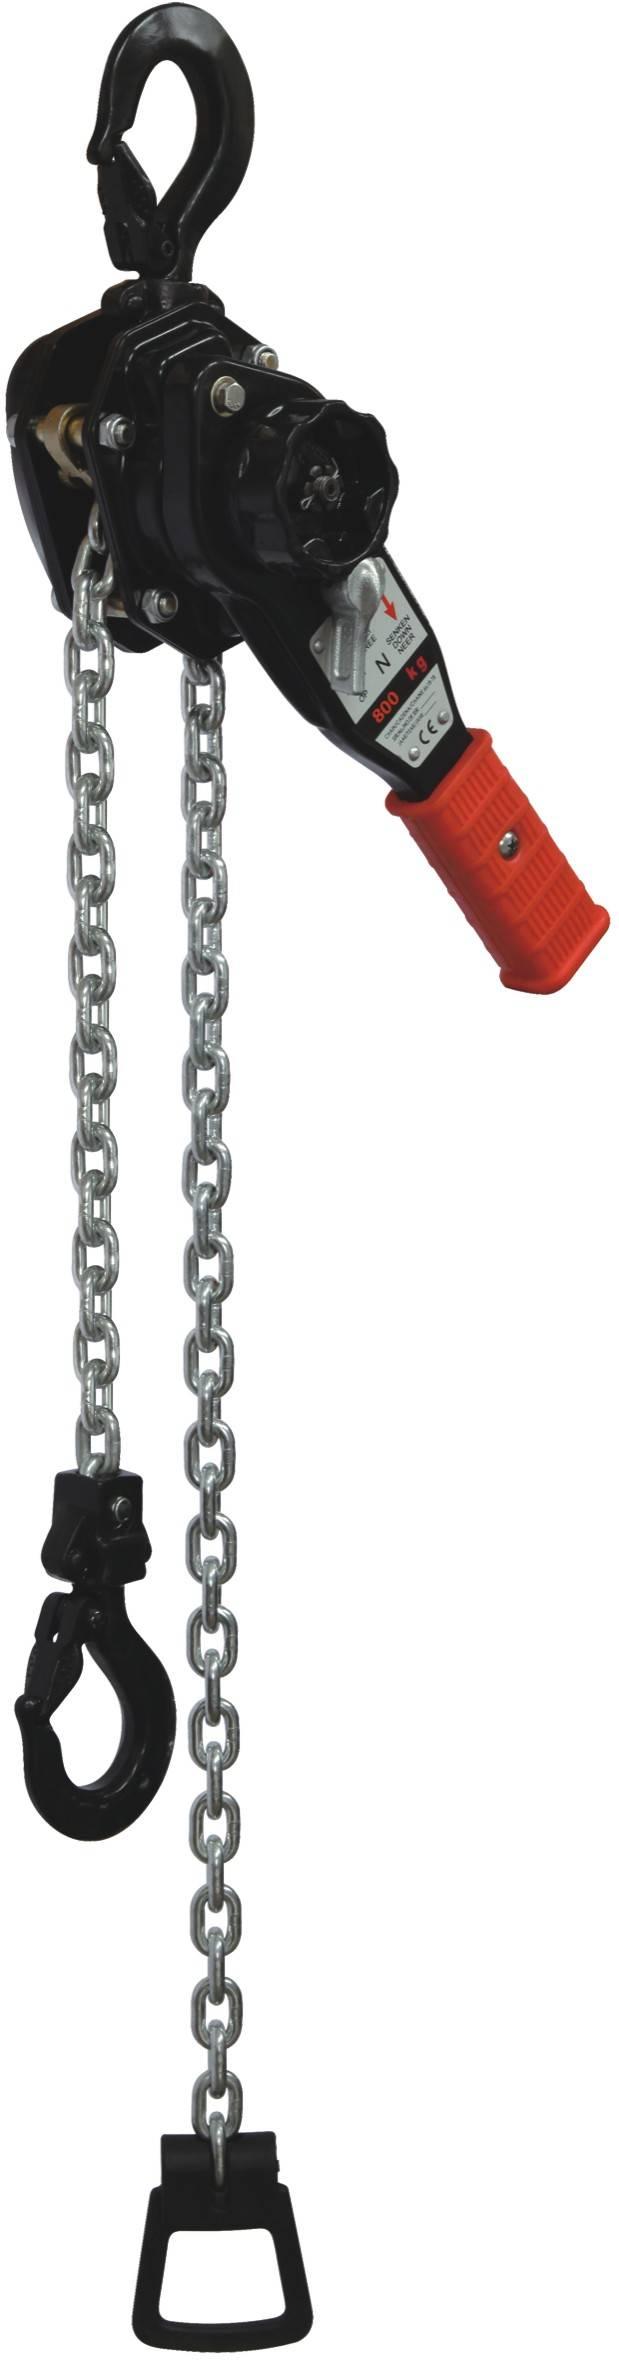 LH-C Series Lever Hoist Lever Chain Block Crane 0.75t-9t